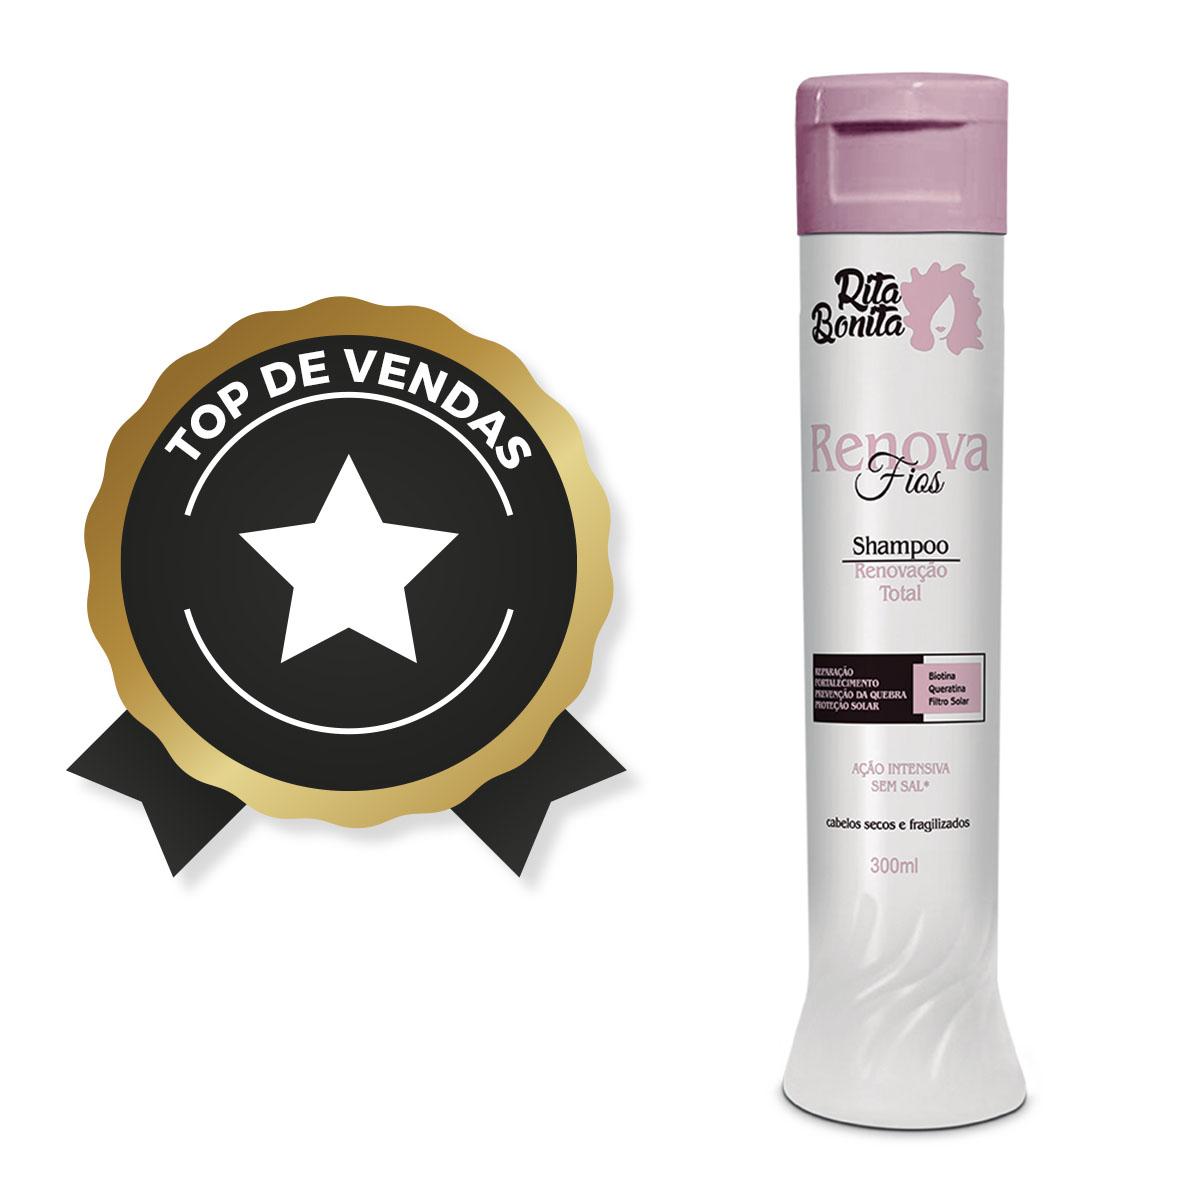 Renova Fios - Shampoo Rita Bonita 300ml